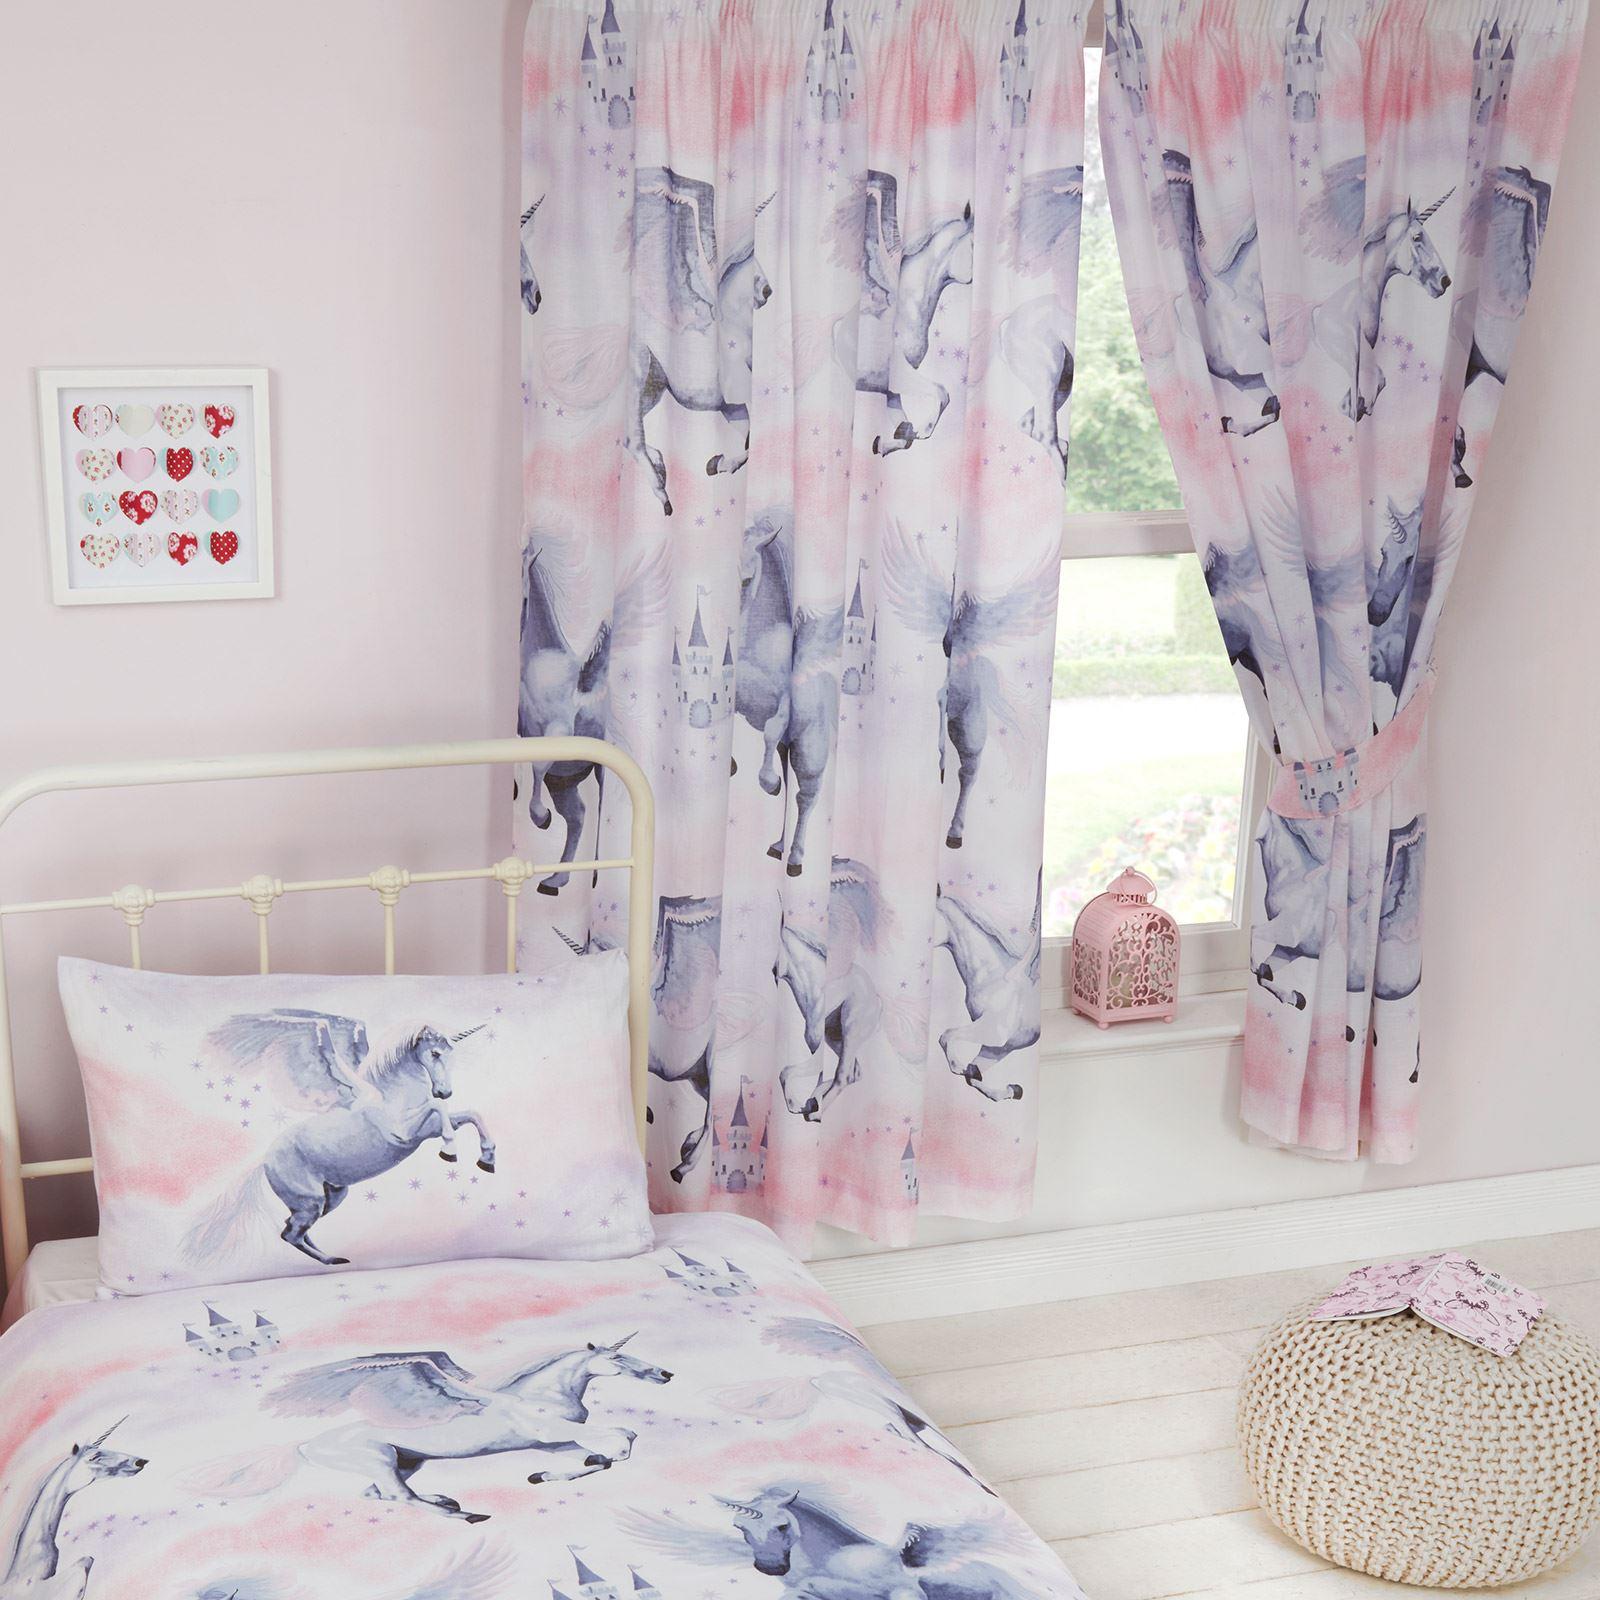 Cot Bed Duvet Cover Unicorn